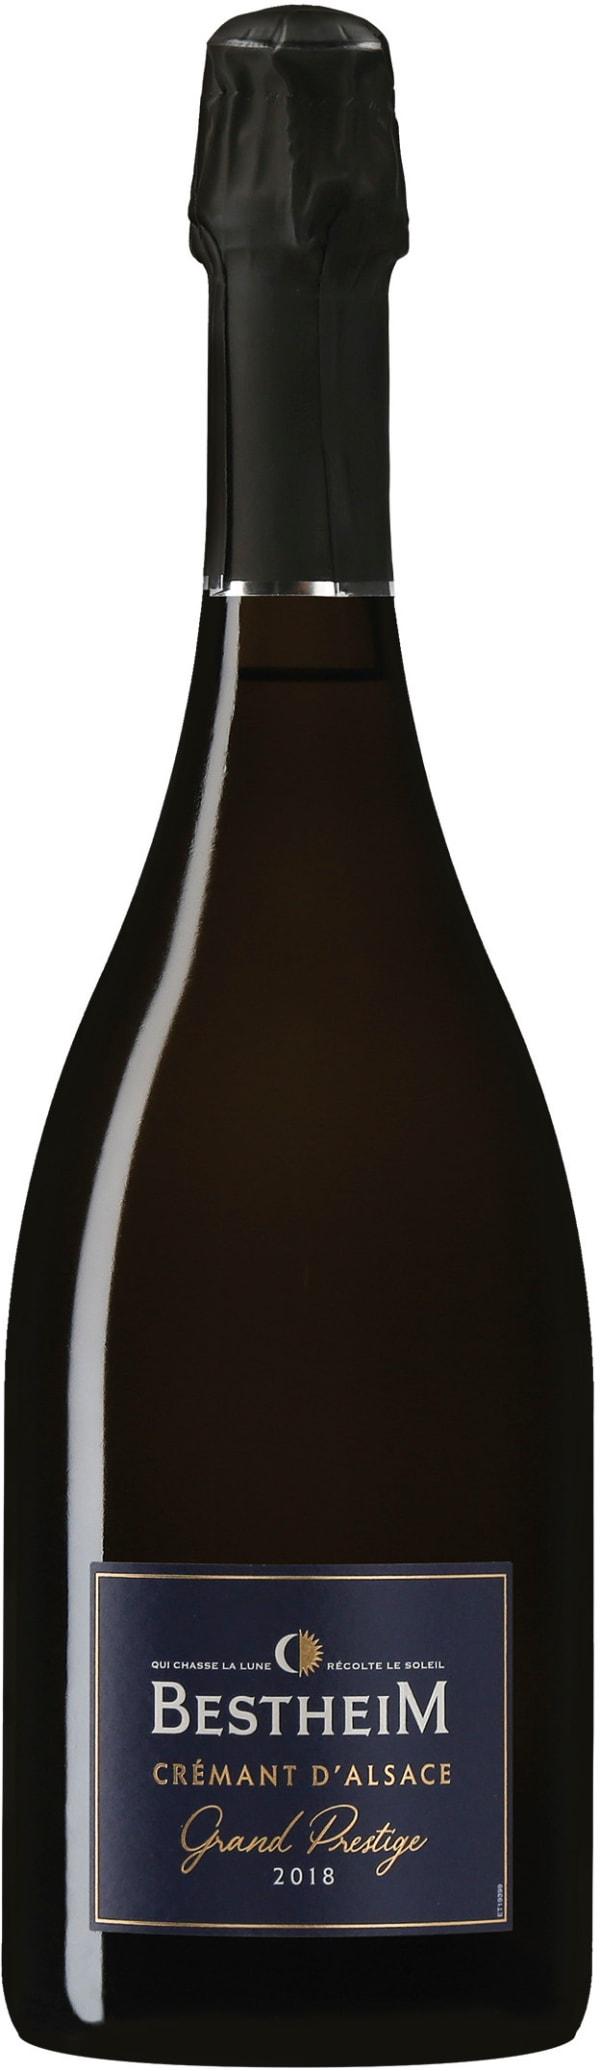 Bestheim Grand Prestige Crémant d'Alsace Brut 2014